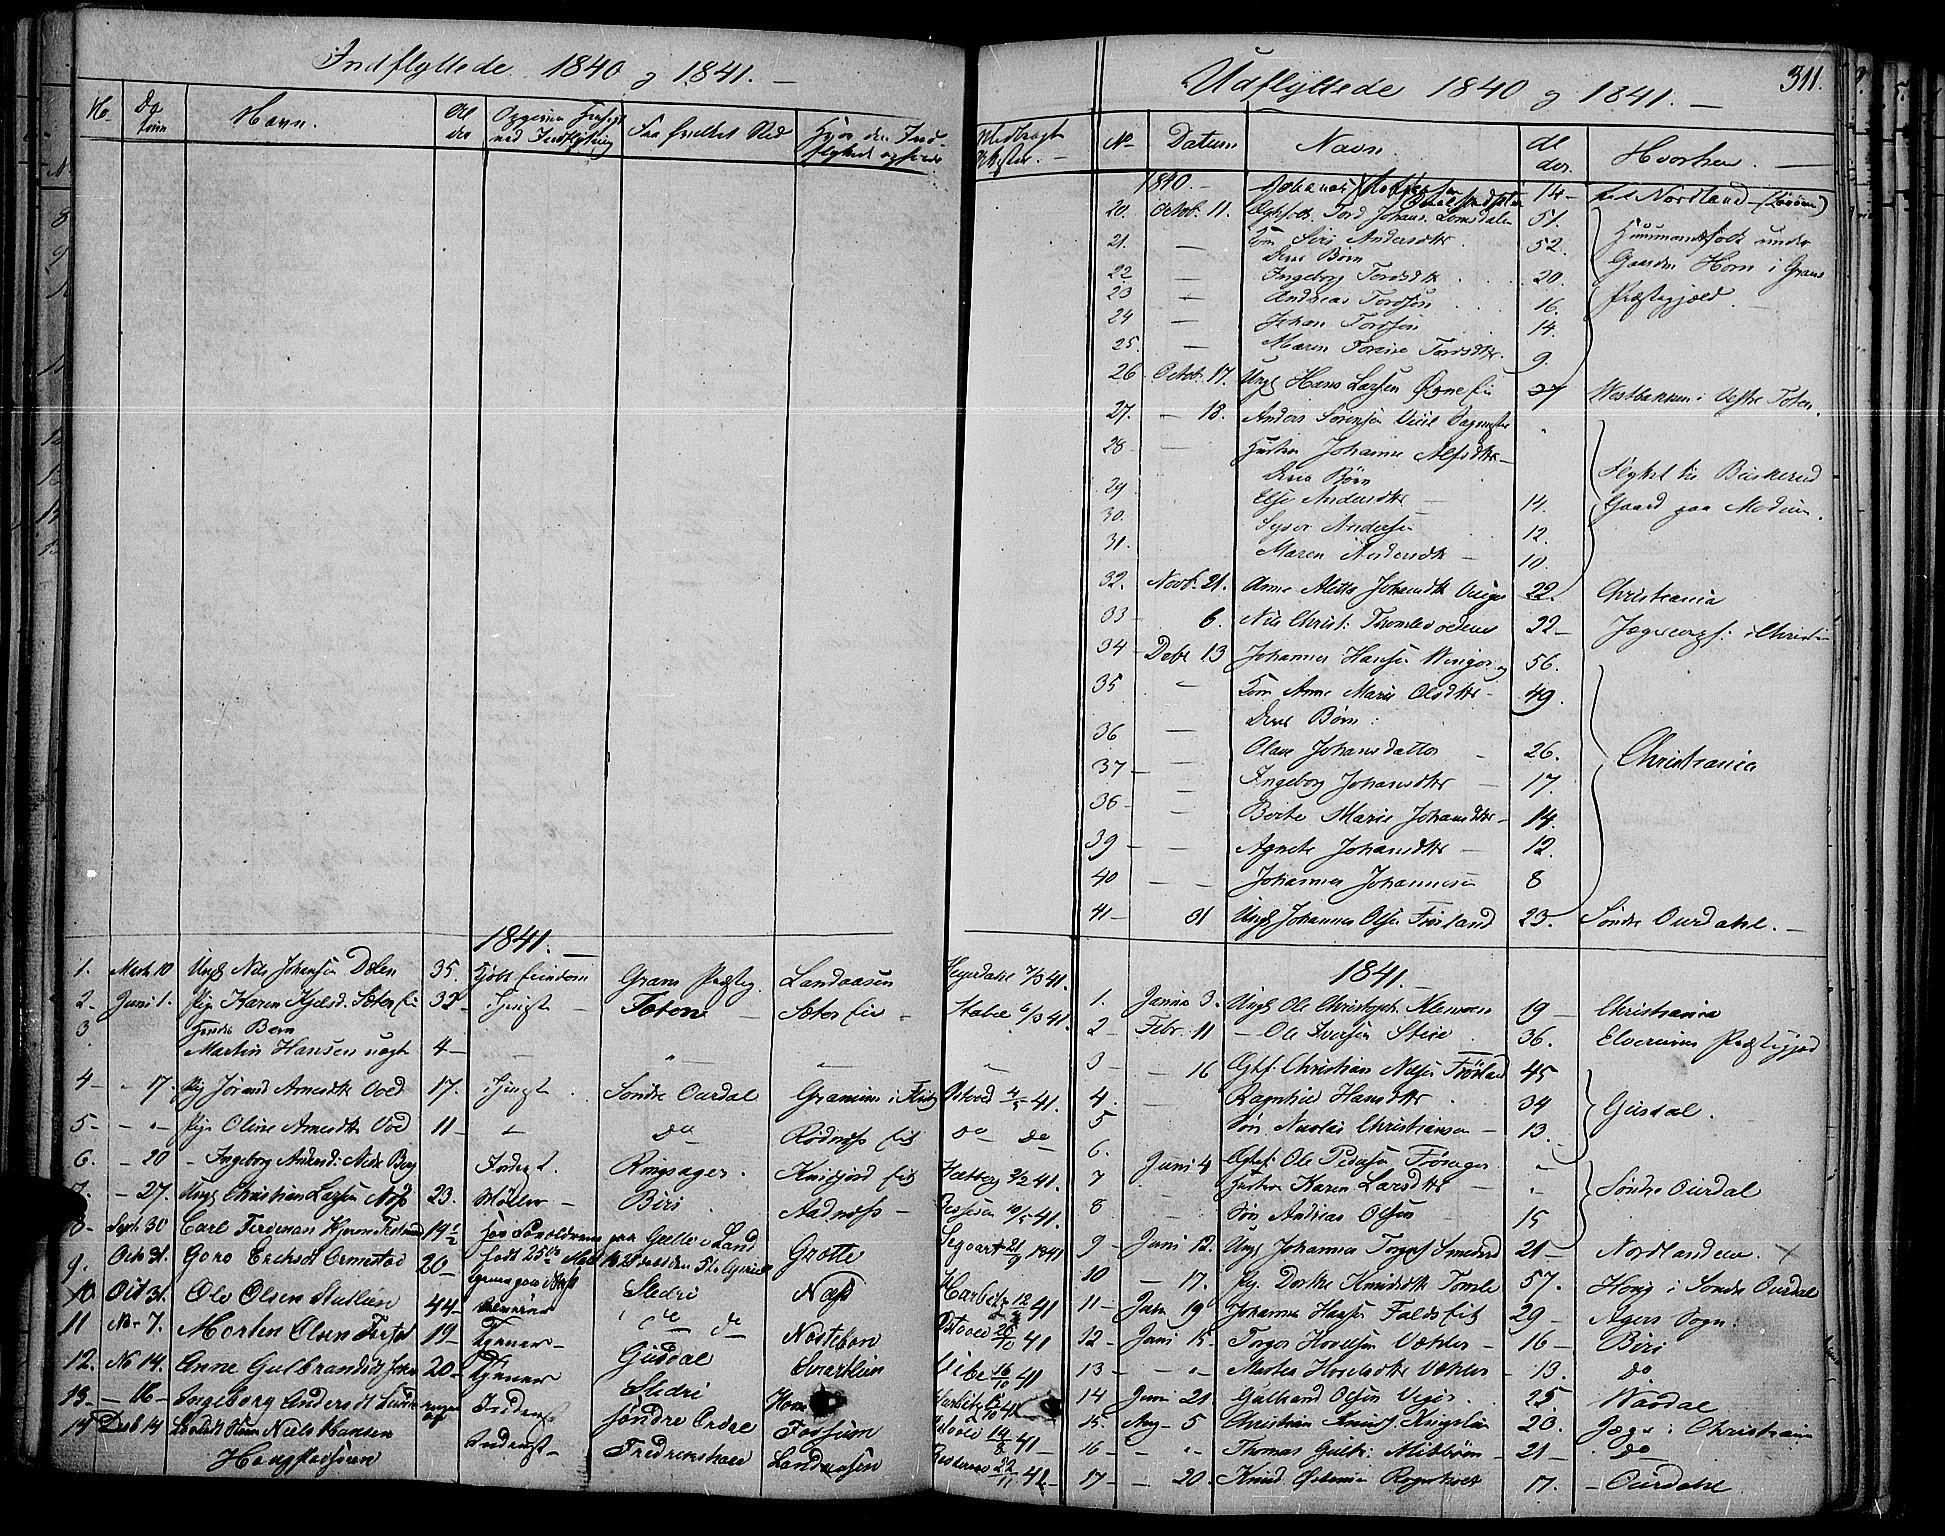 SAH, Land prestekontor, Ministerialbok nr. 8, 1830-1846, s. 311